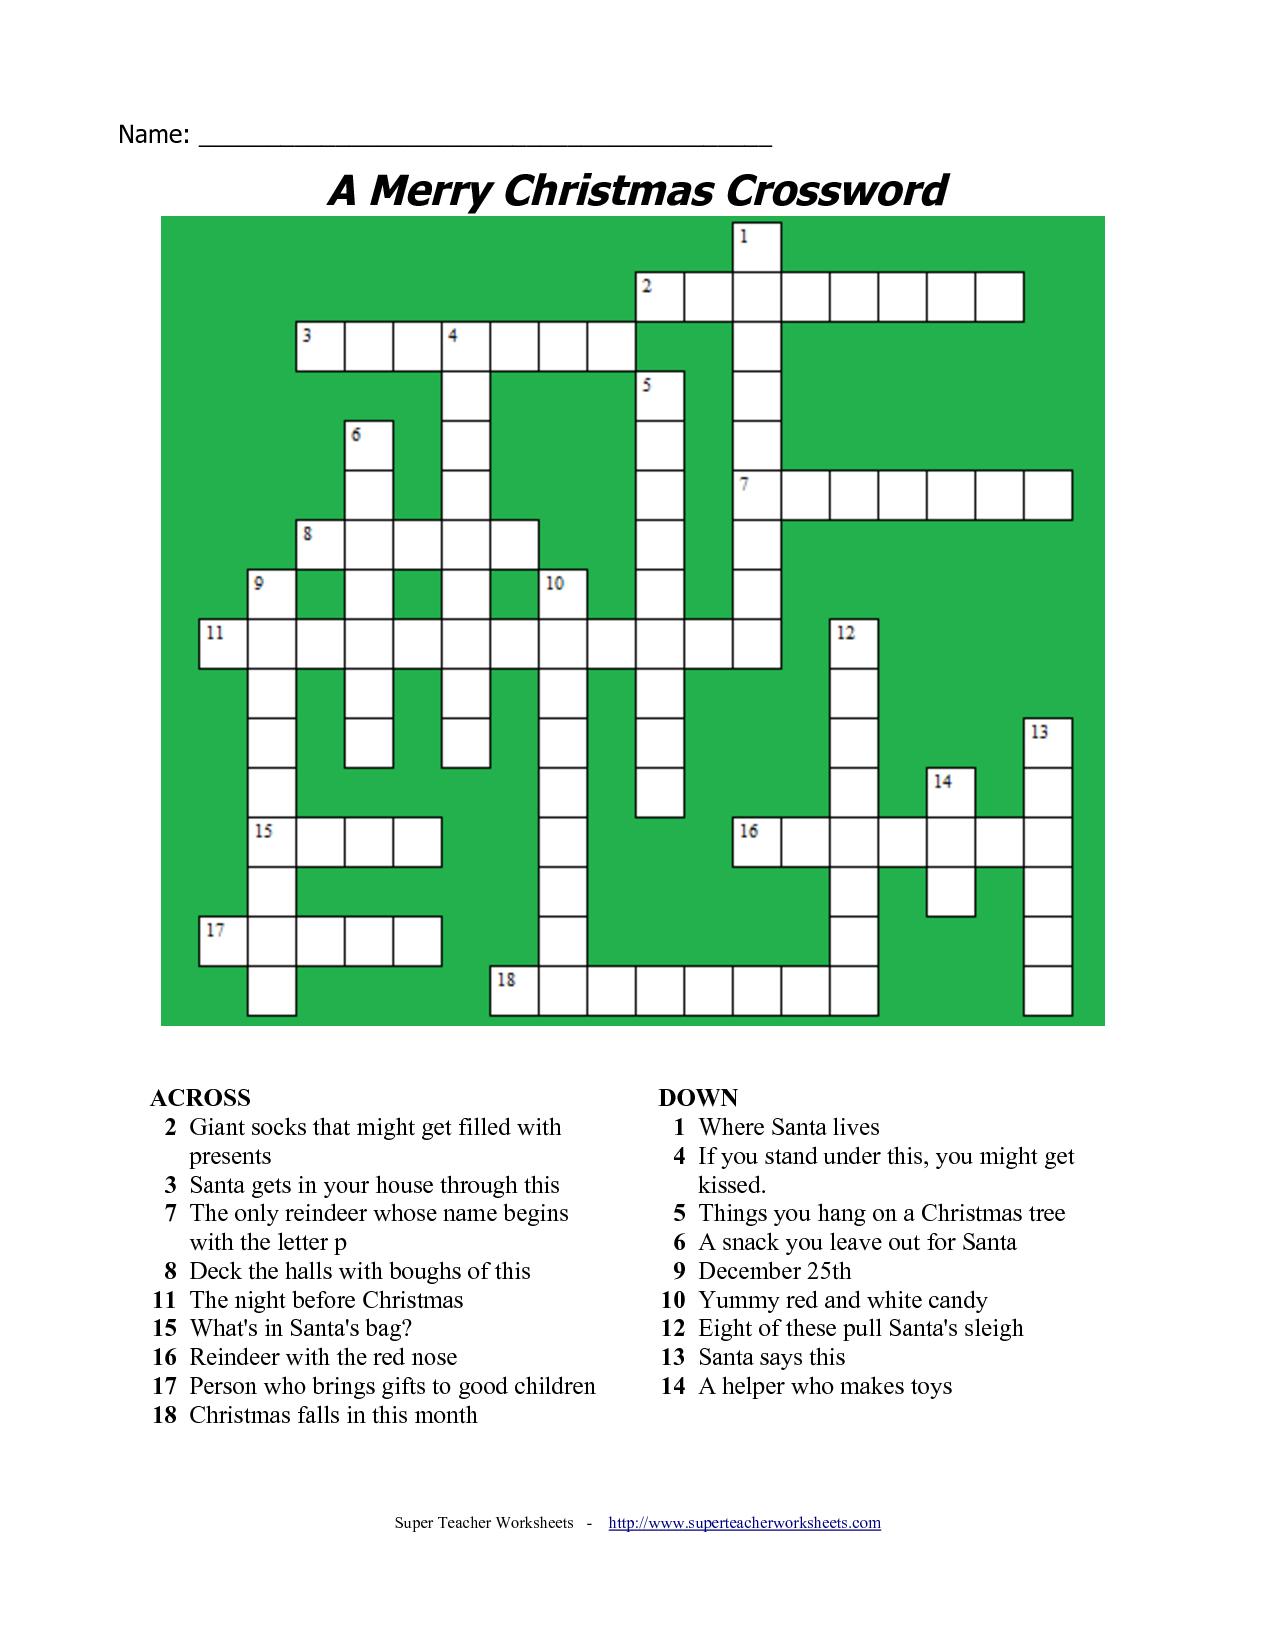 20 Fun Printable Christmas Crossword Puzzles | Kittybabylove - Printable Crossword Puzzles Christmas